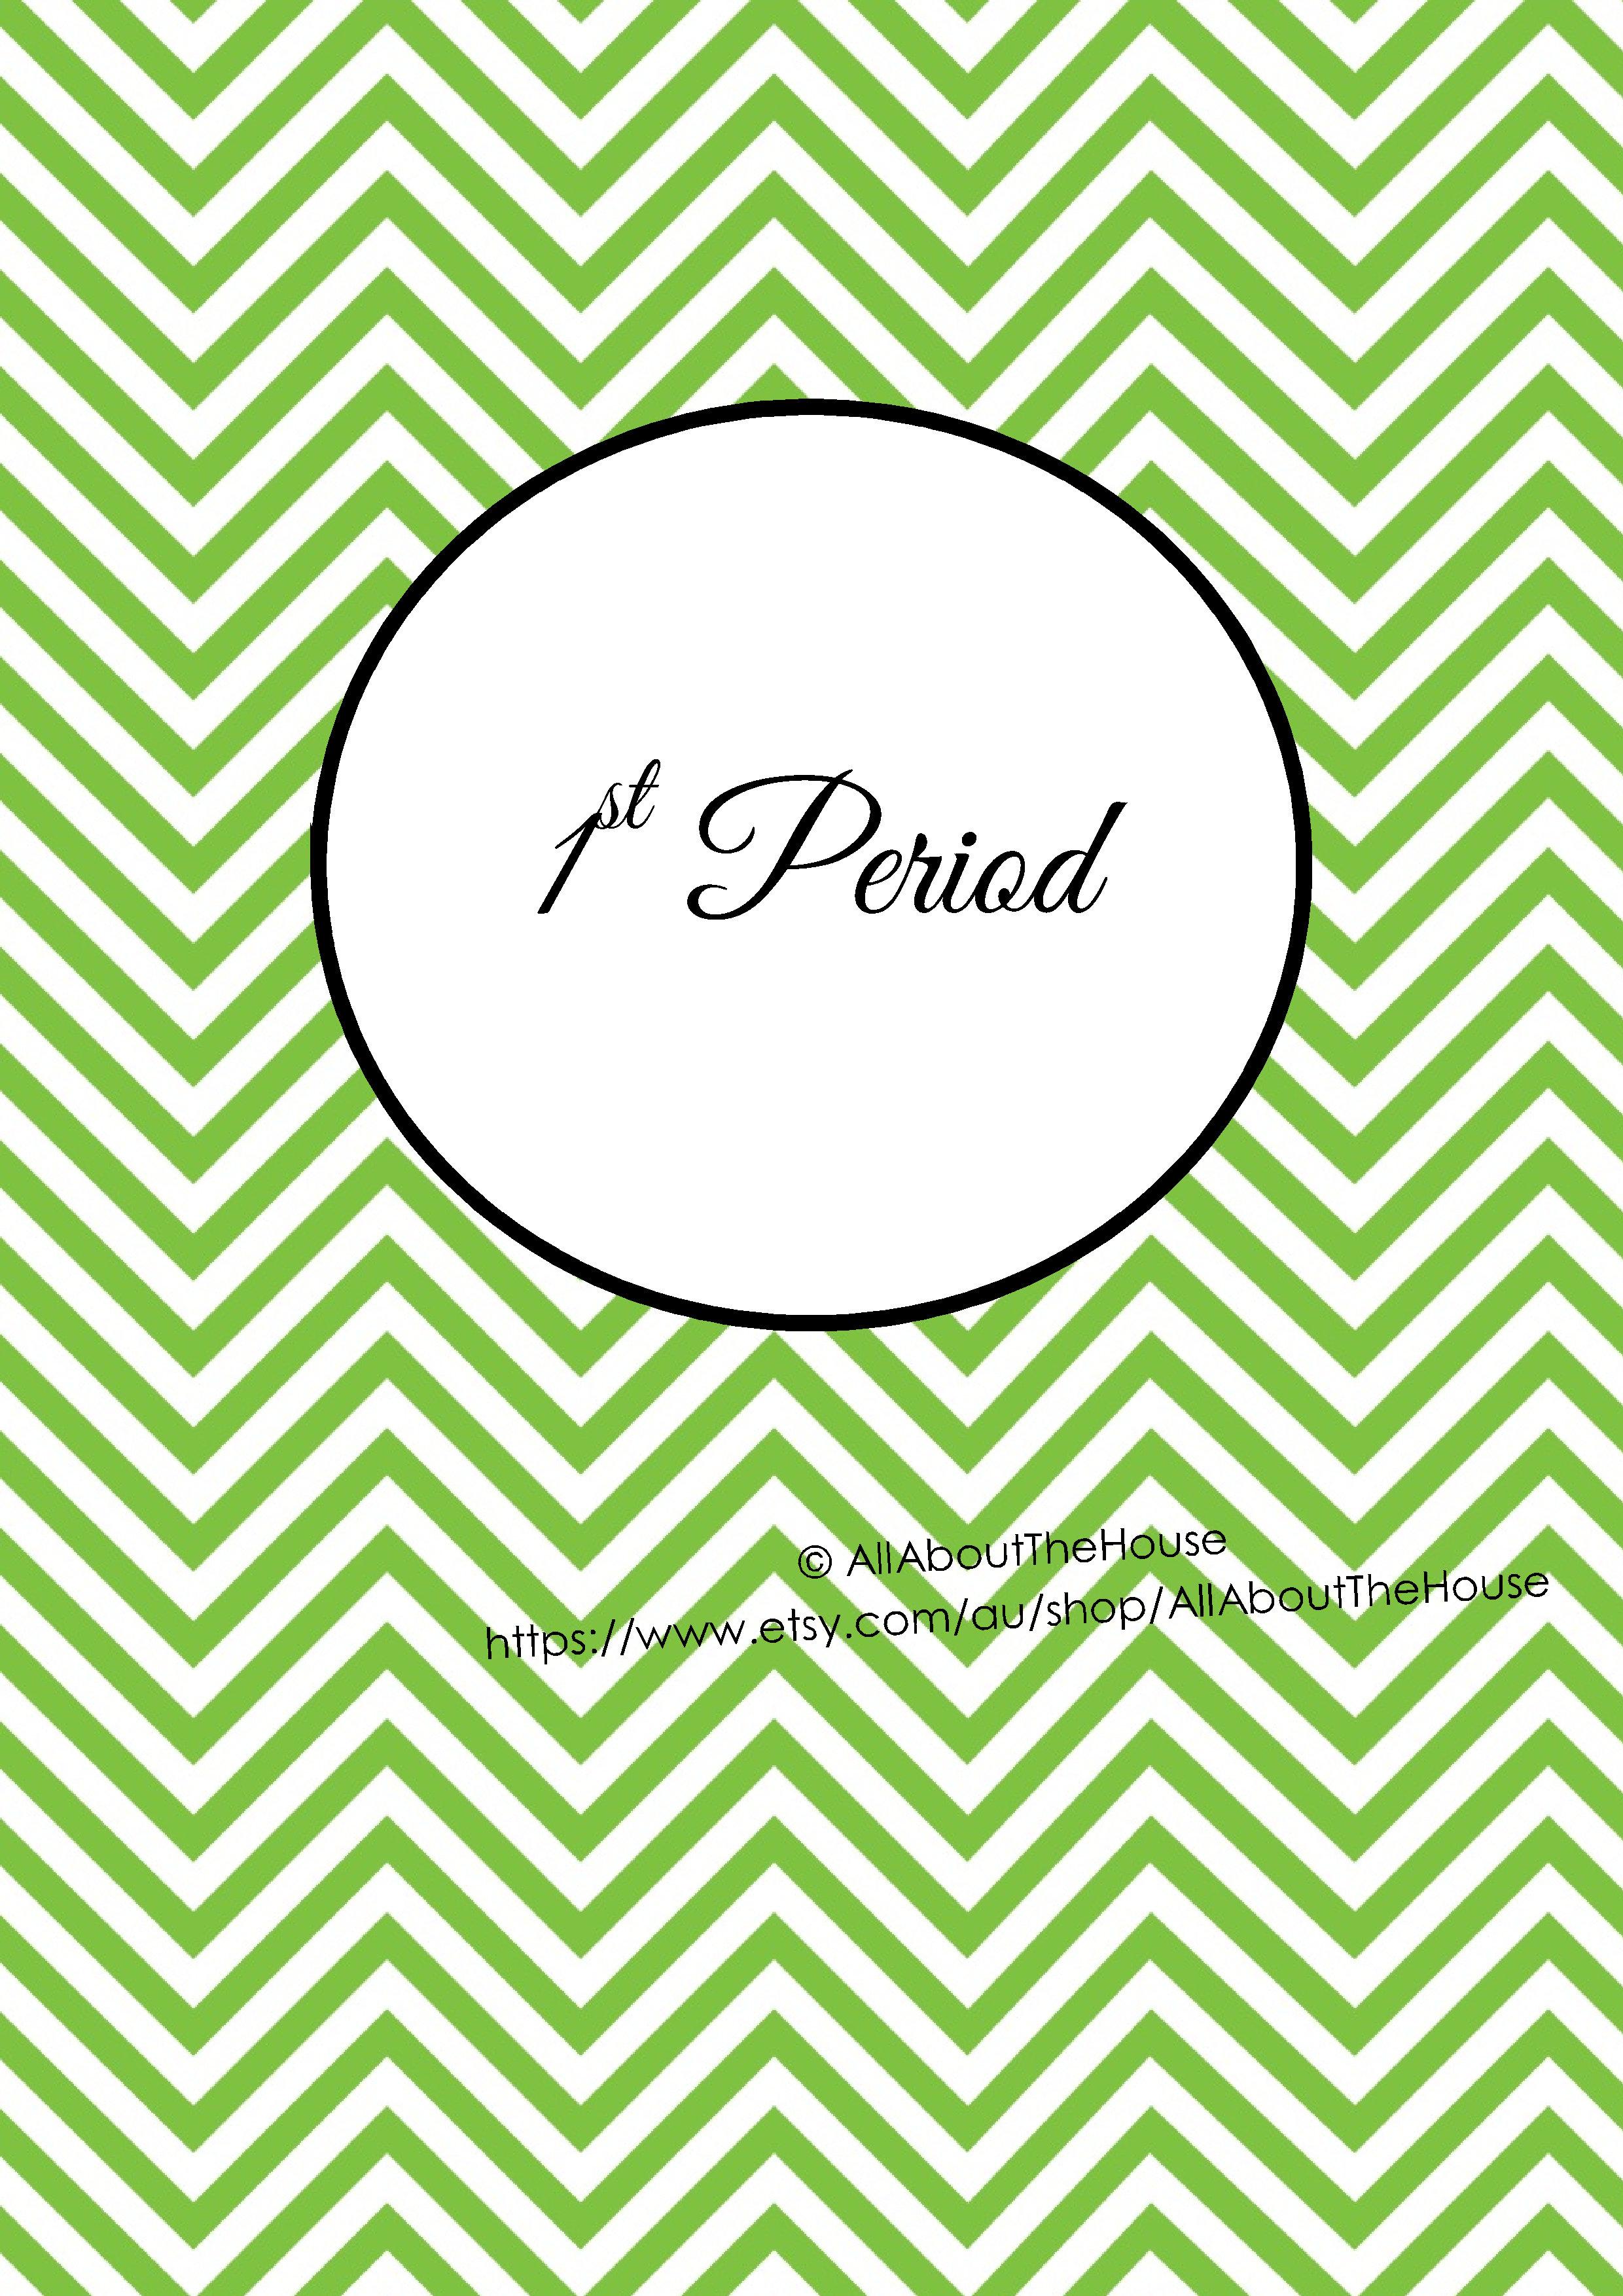 1st Period - Green